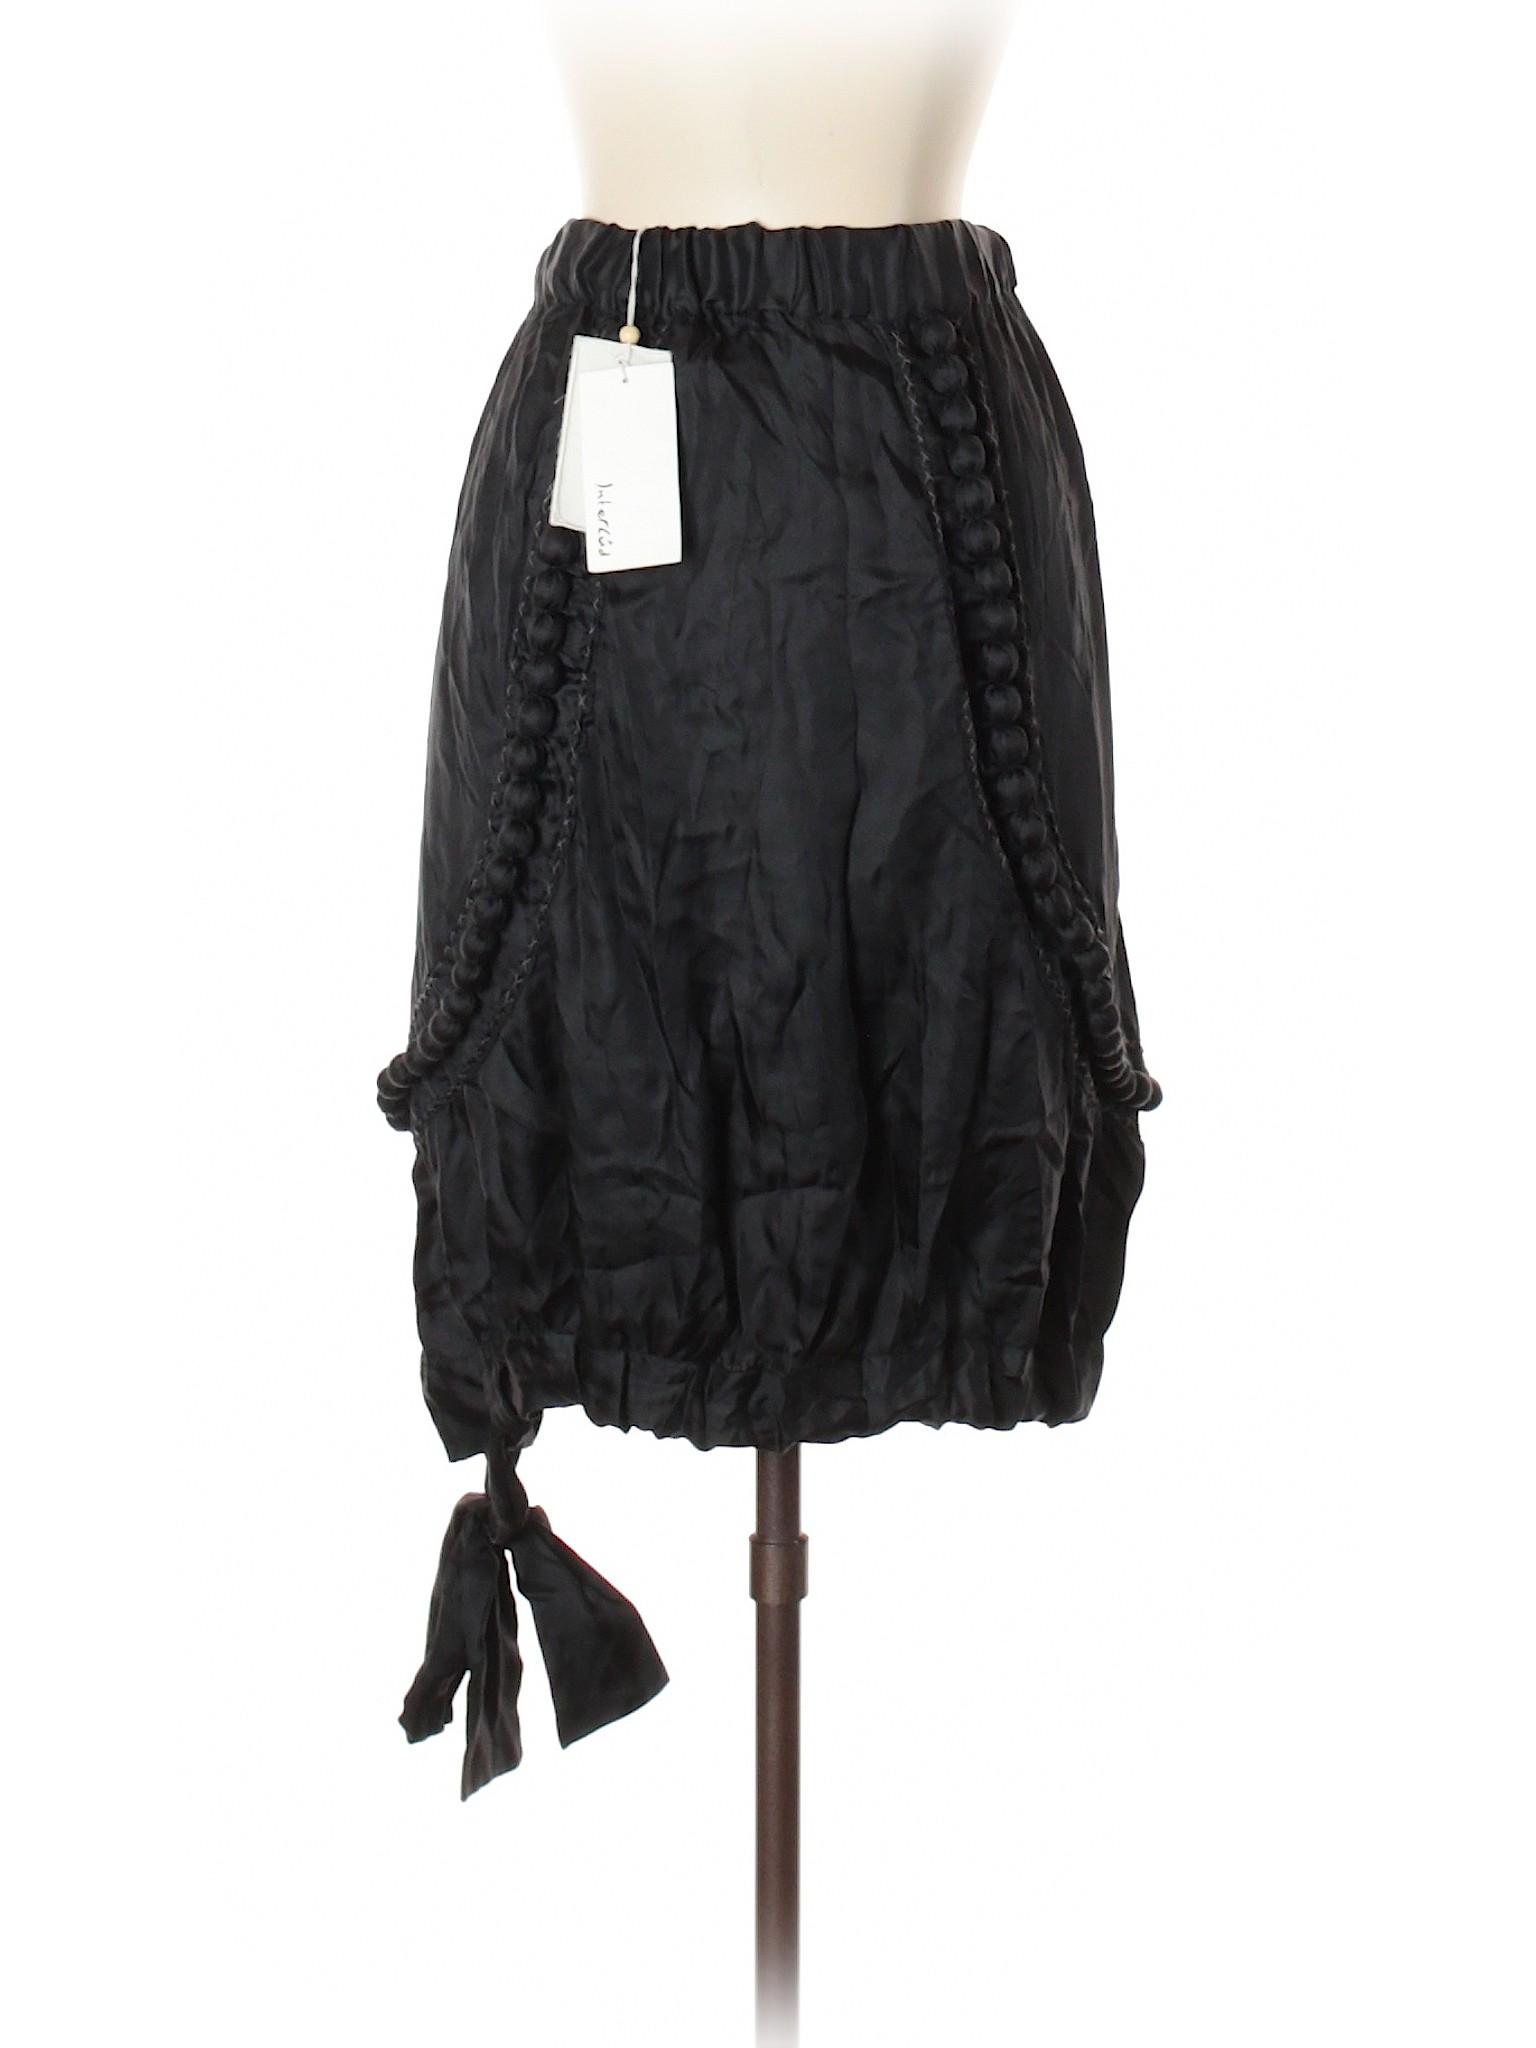 Boutique Skirt Boutique Skirt Silk Silk Boutique Silk Skirt Boutique Silk Skirt Boutique 6wZn46Yqx